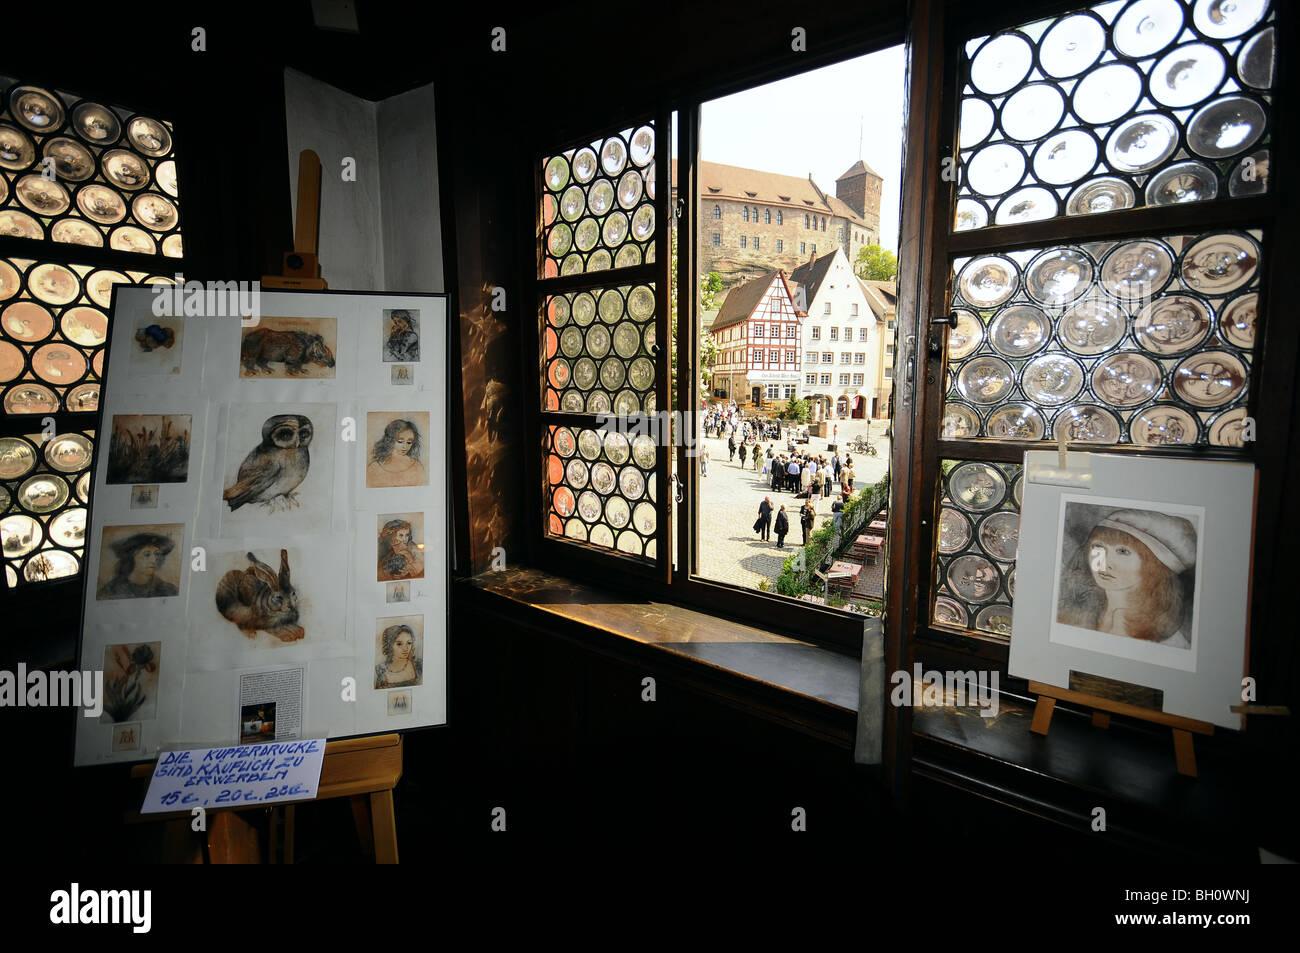 Ausstellung im Albrecht-Dürer-Haus, Nürnberg, Middle Franconia, Bayern, Deutschland Stockbild